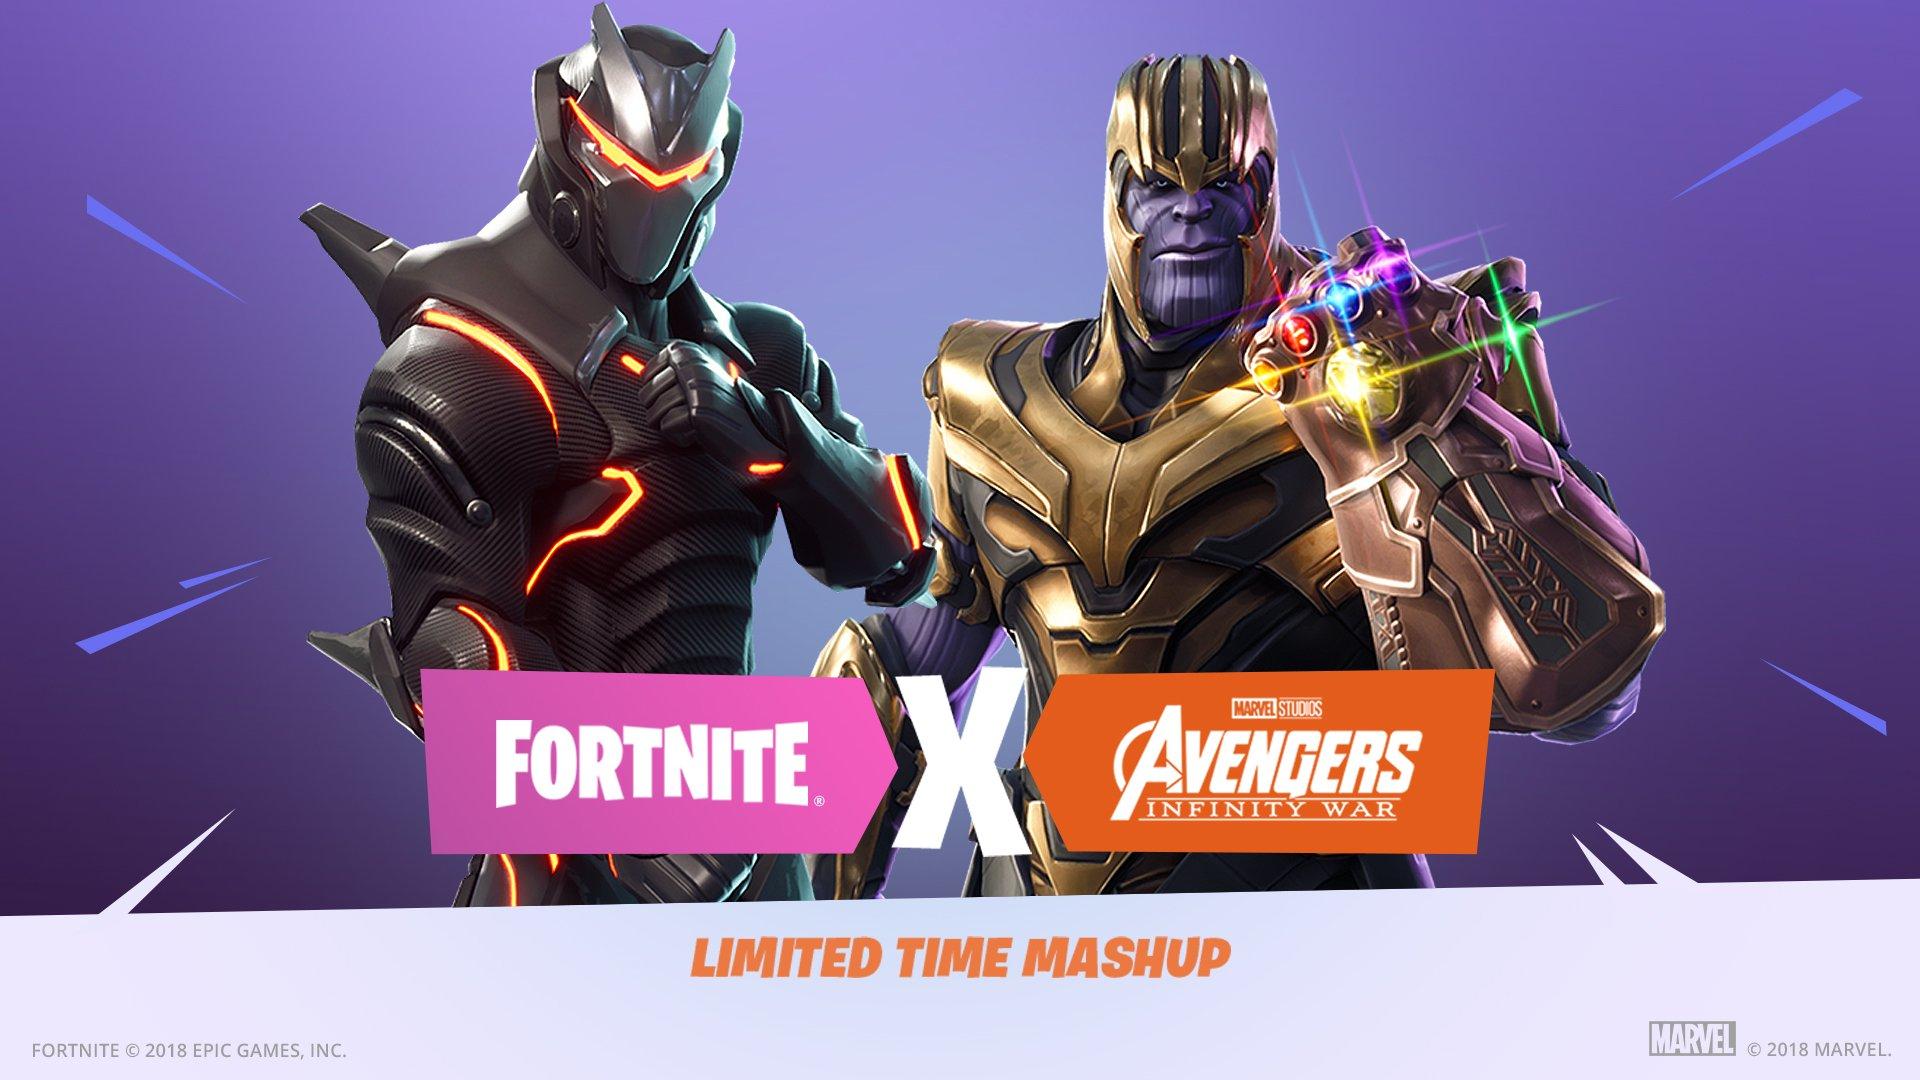 Fortnite Thanos Infinity War PUBG